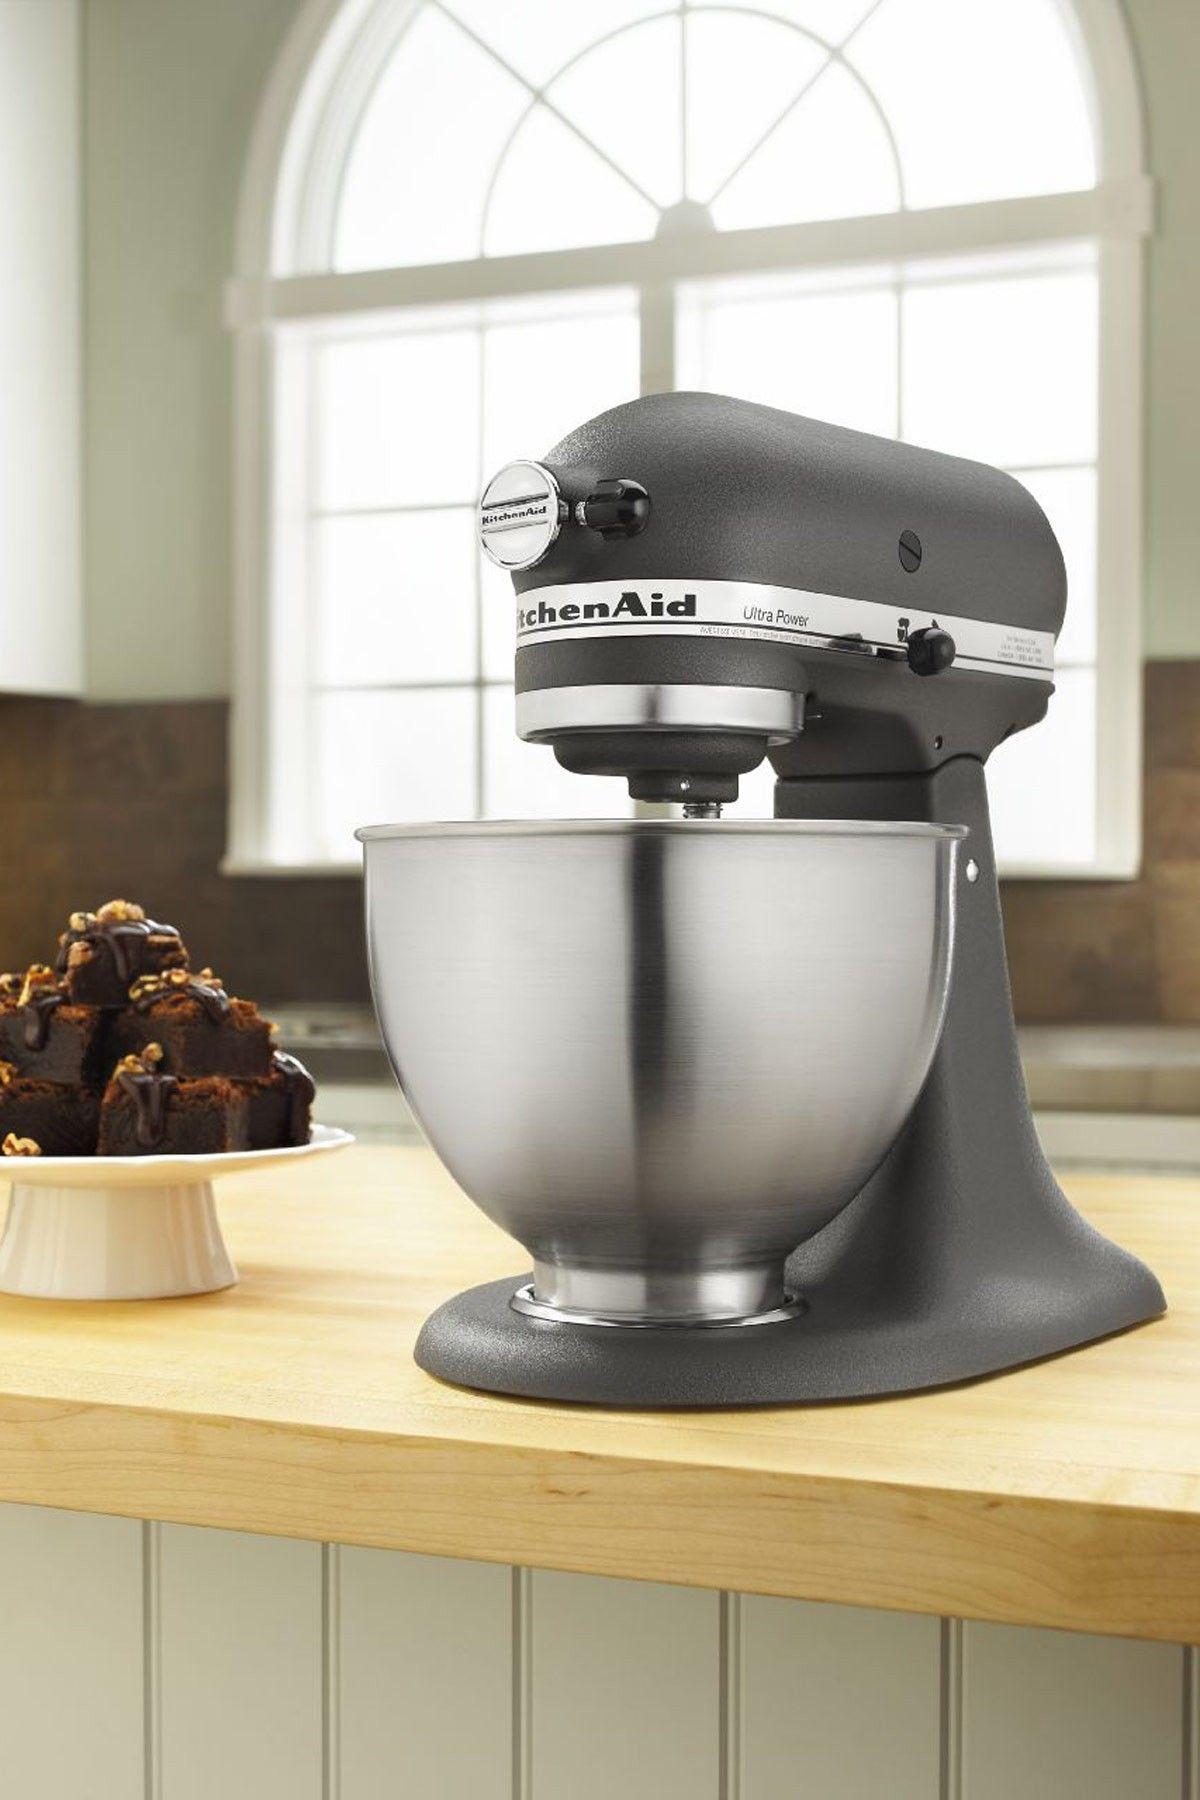 Kitchenaid Ultra Power Tilt Head Stand Mixer Imperial